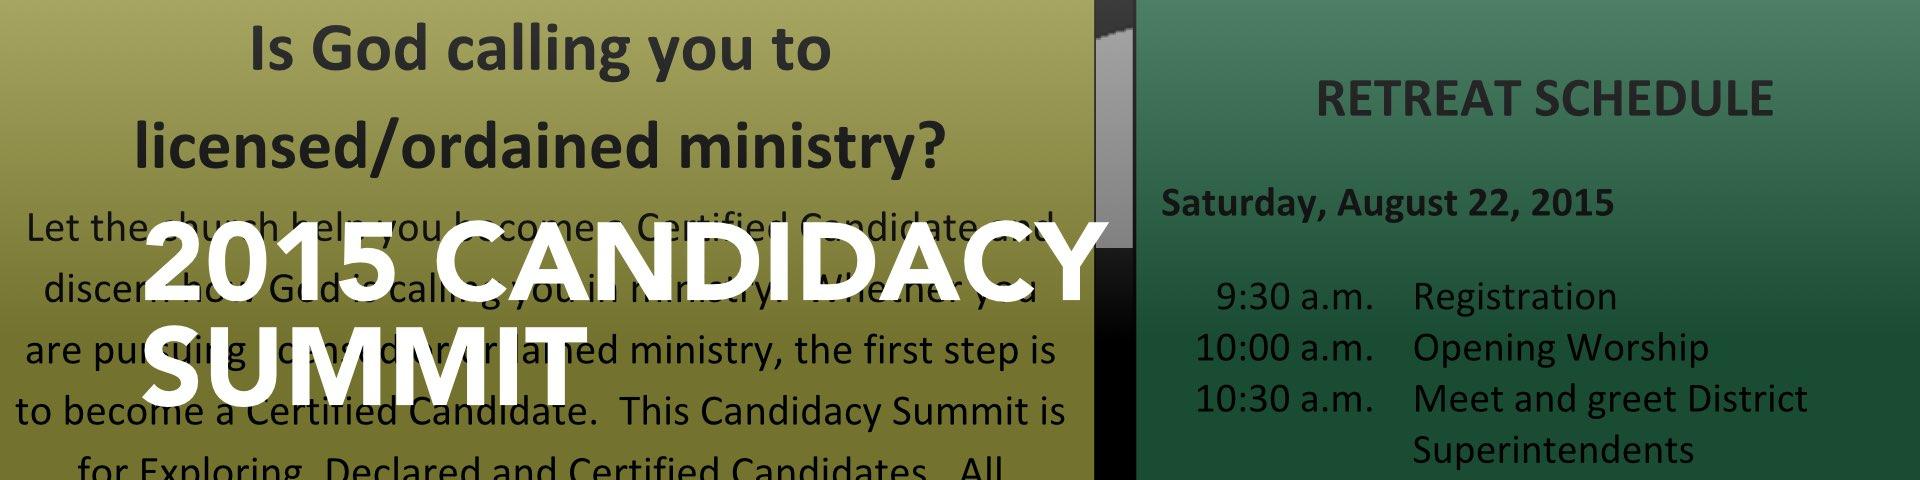 candidacy-summit